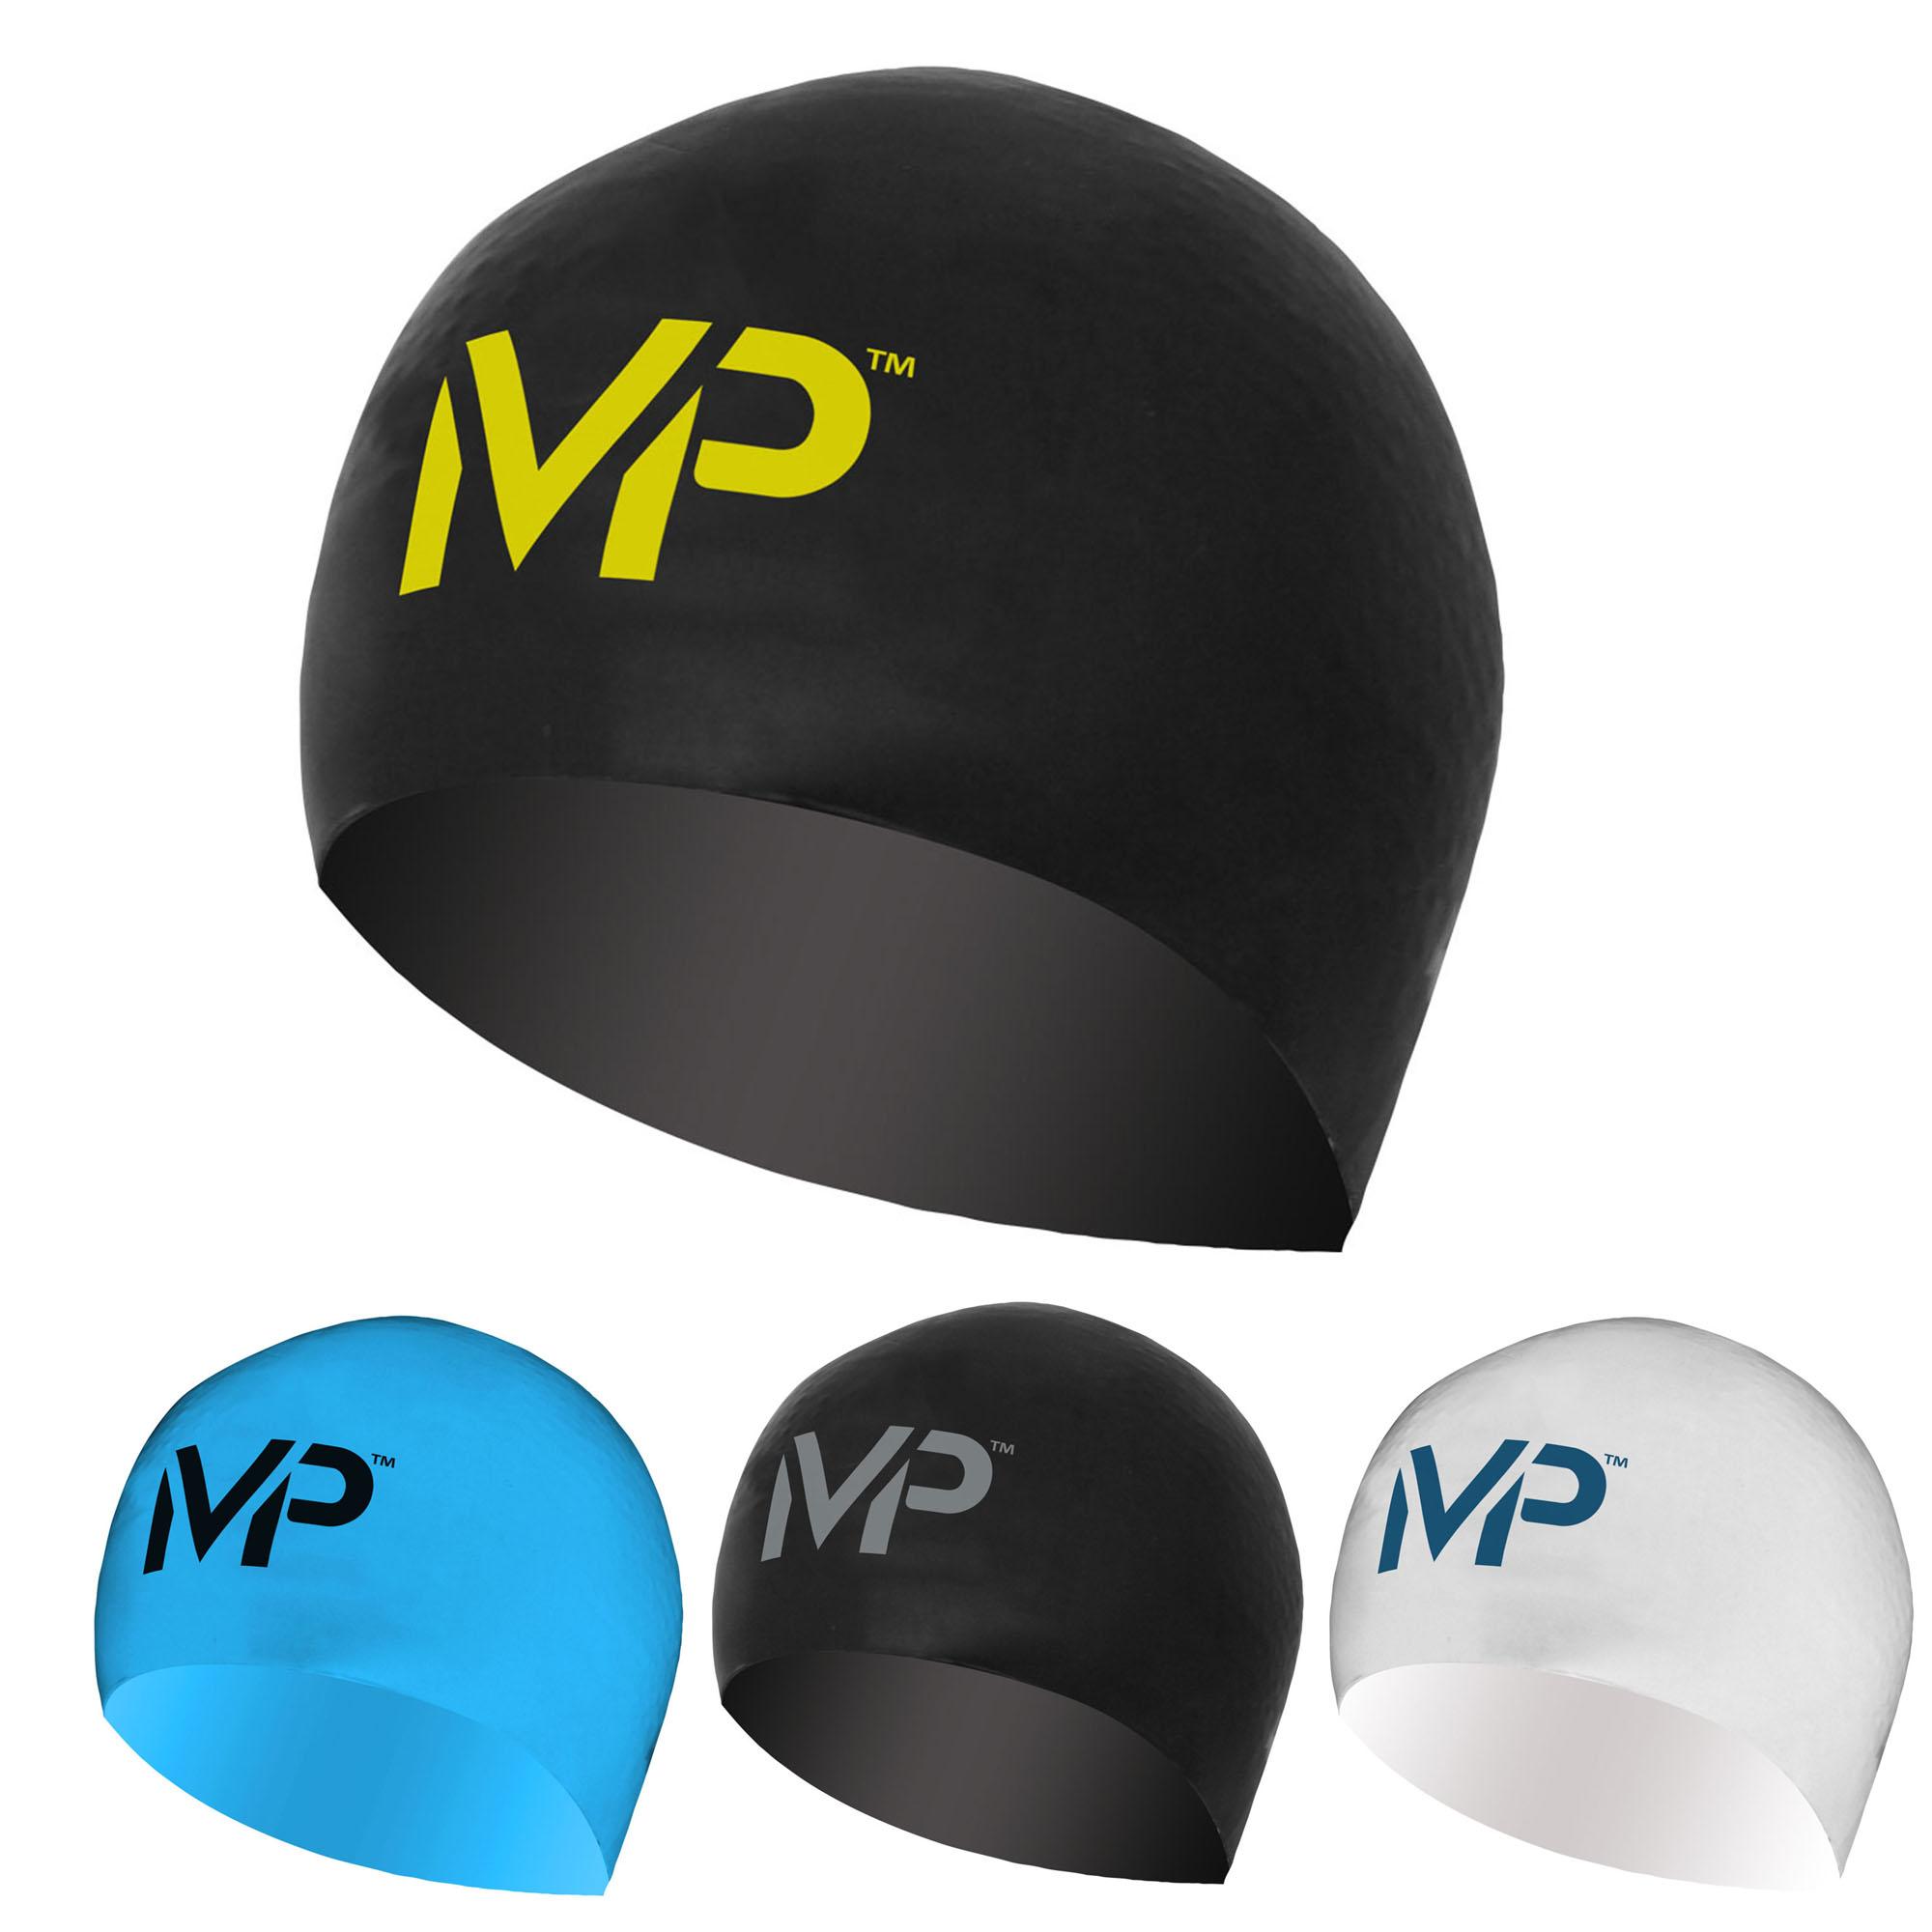 New Aqua Sphere Michael Phelps Race Swim Cap Swimming Pool Triathlon Open Water Ebay